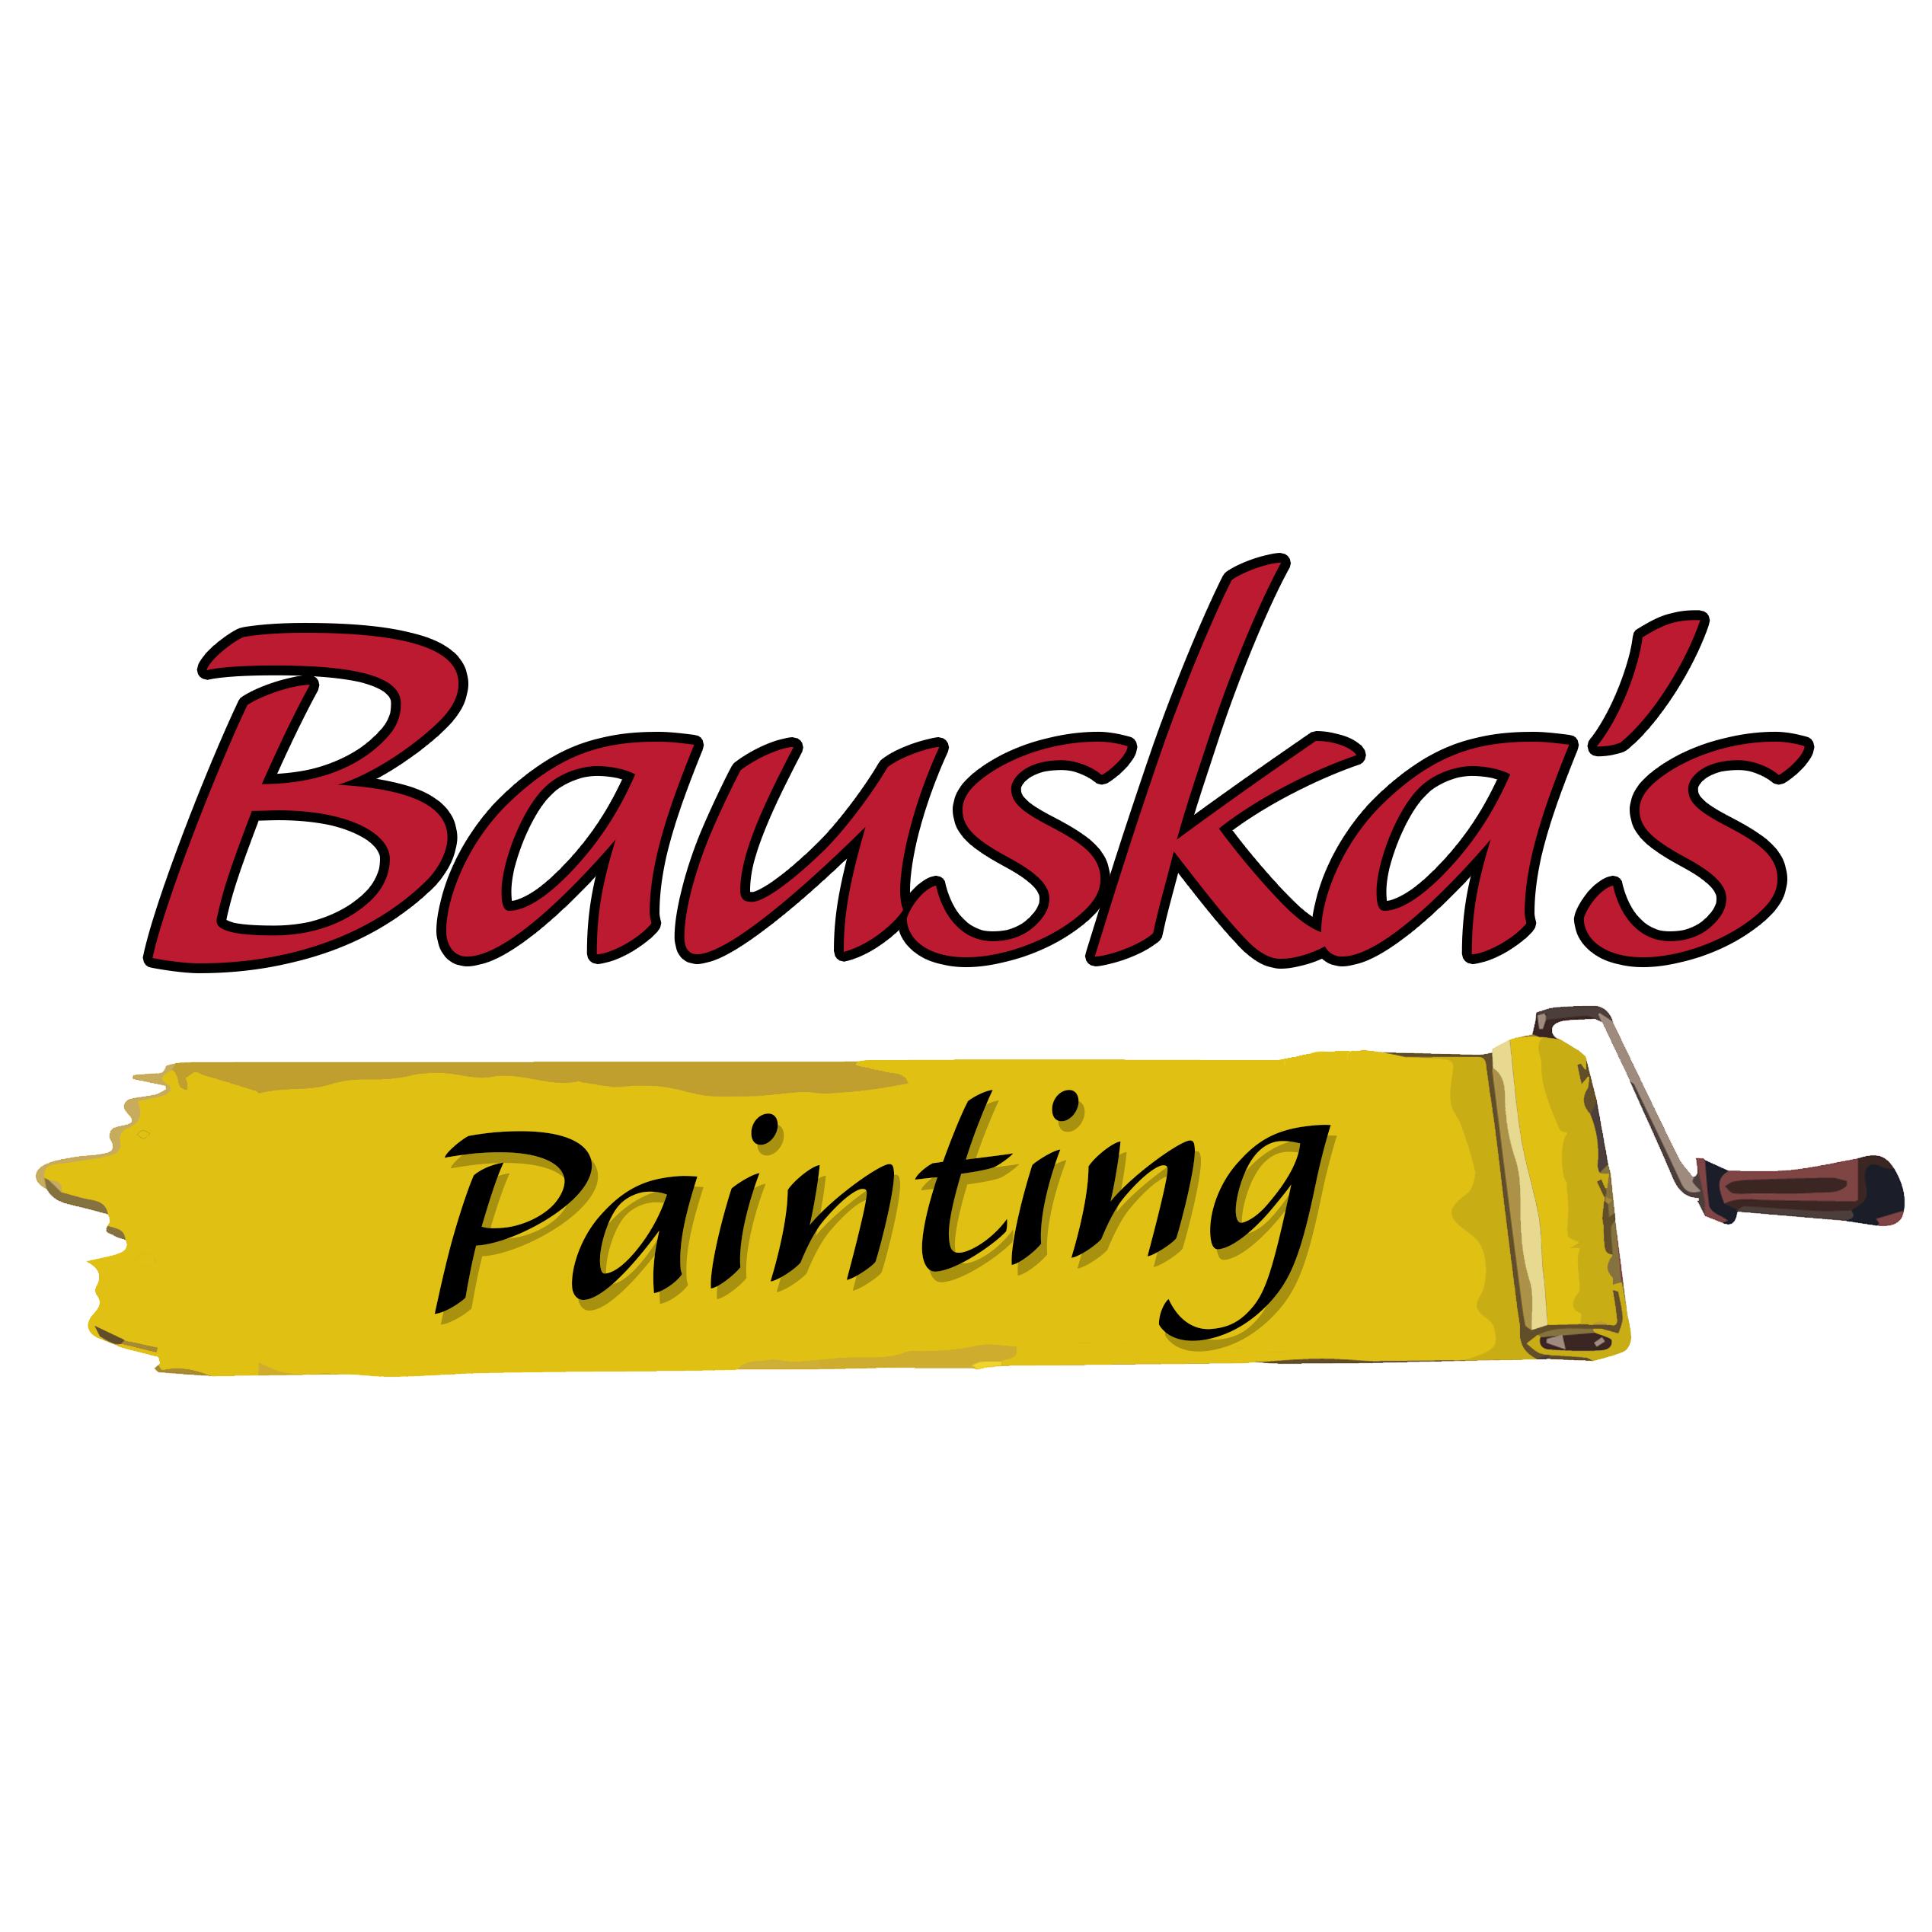 Bauska's Painting